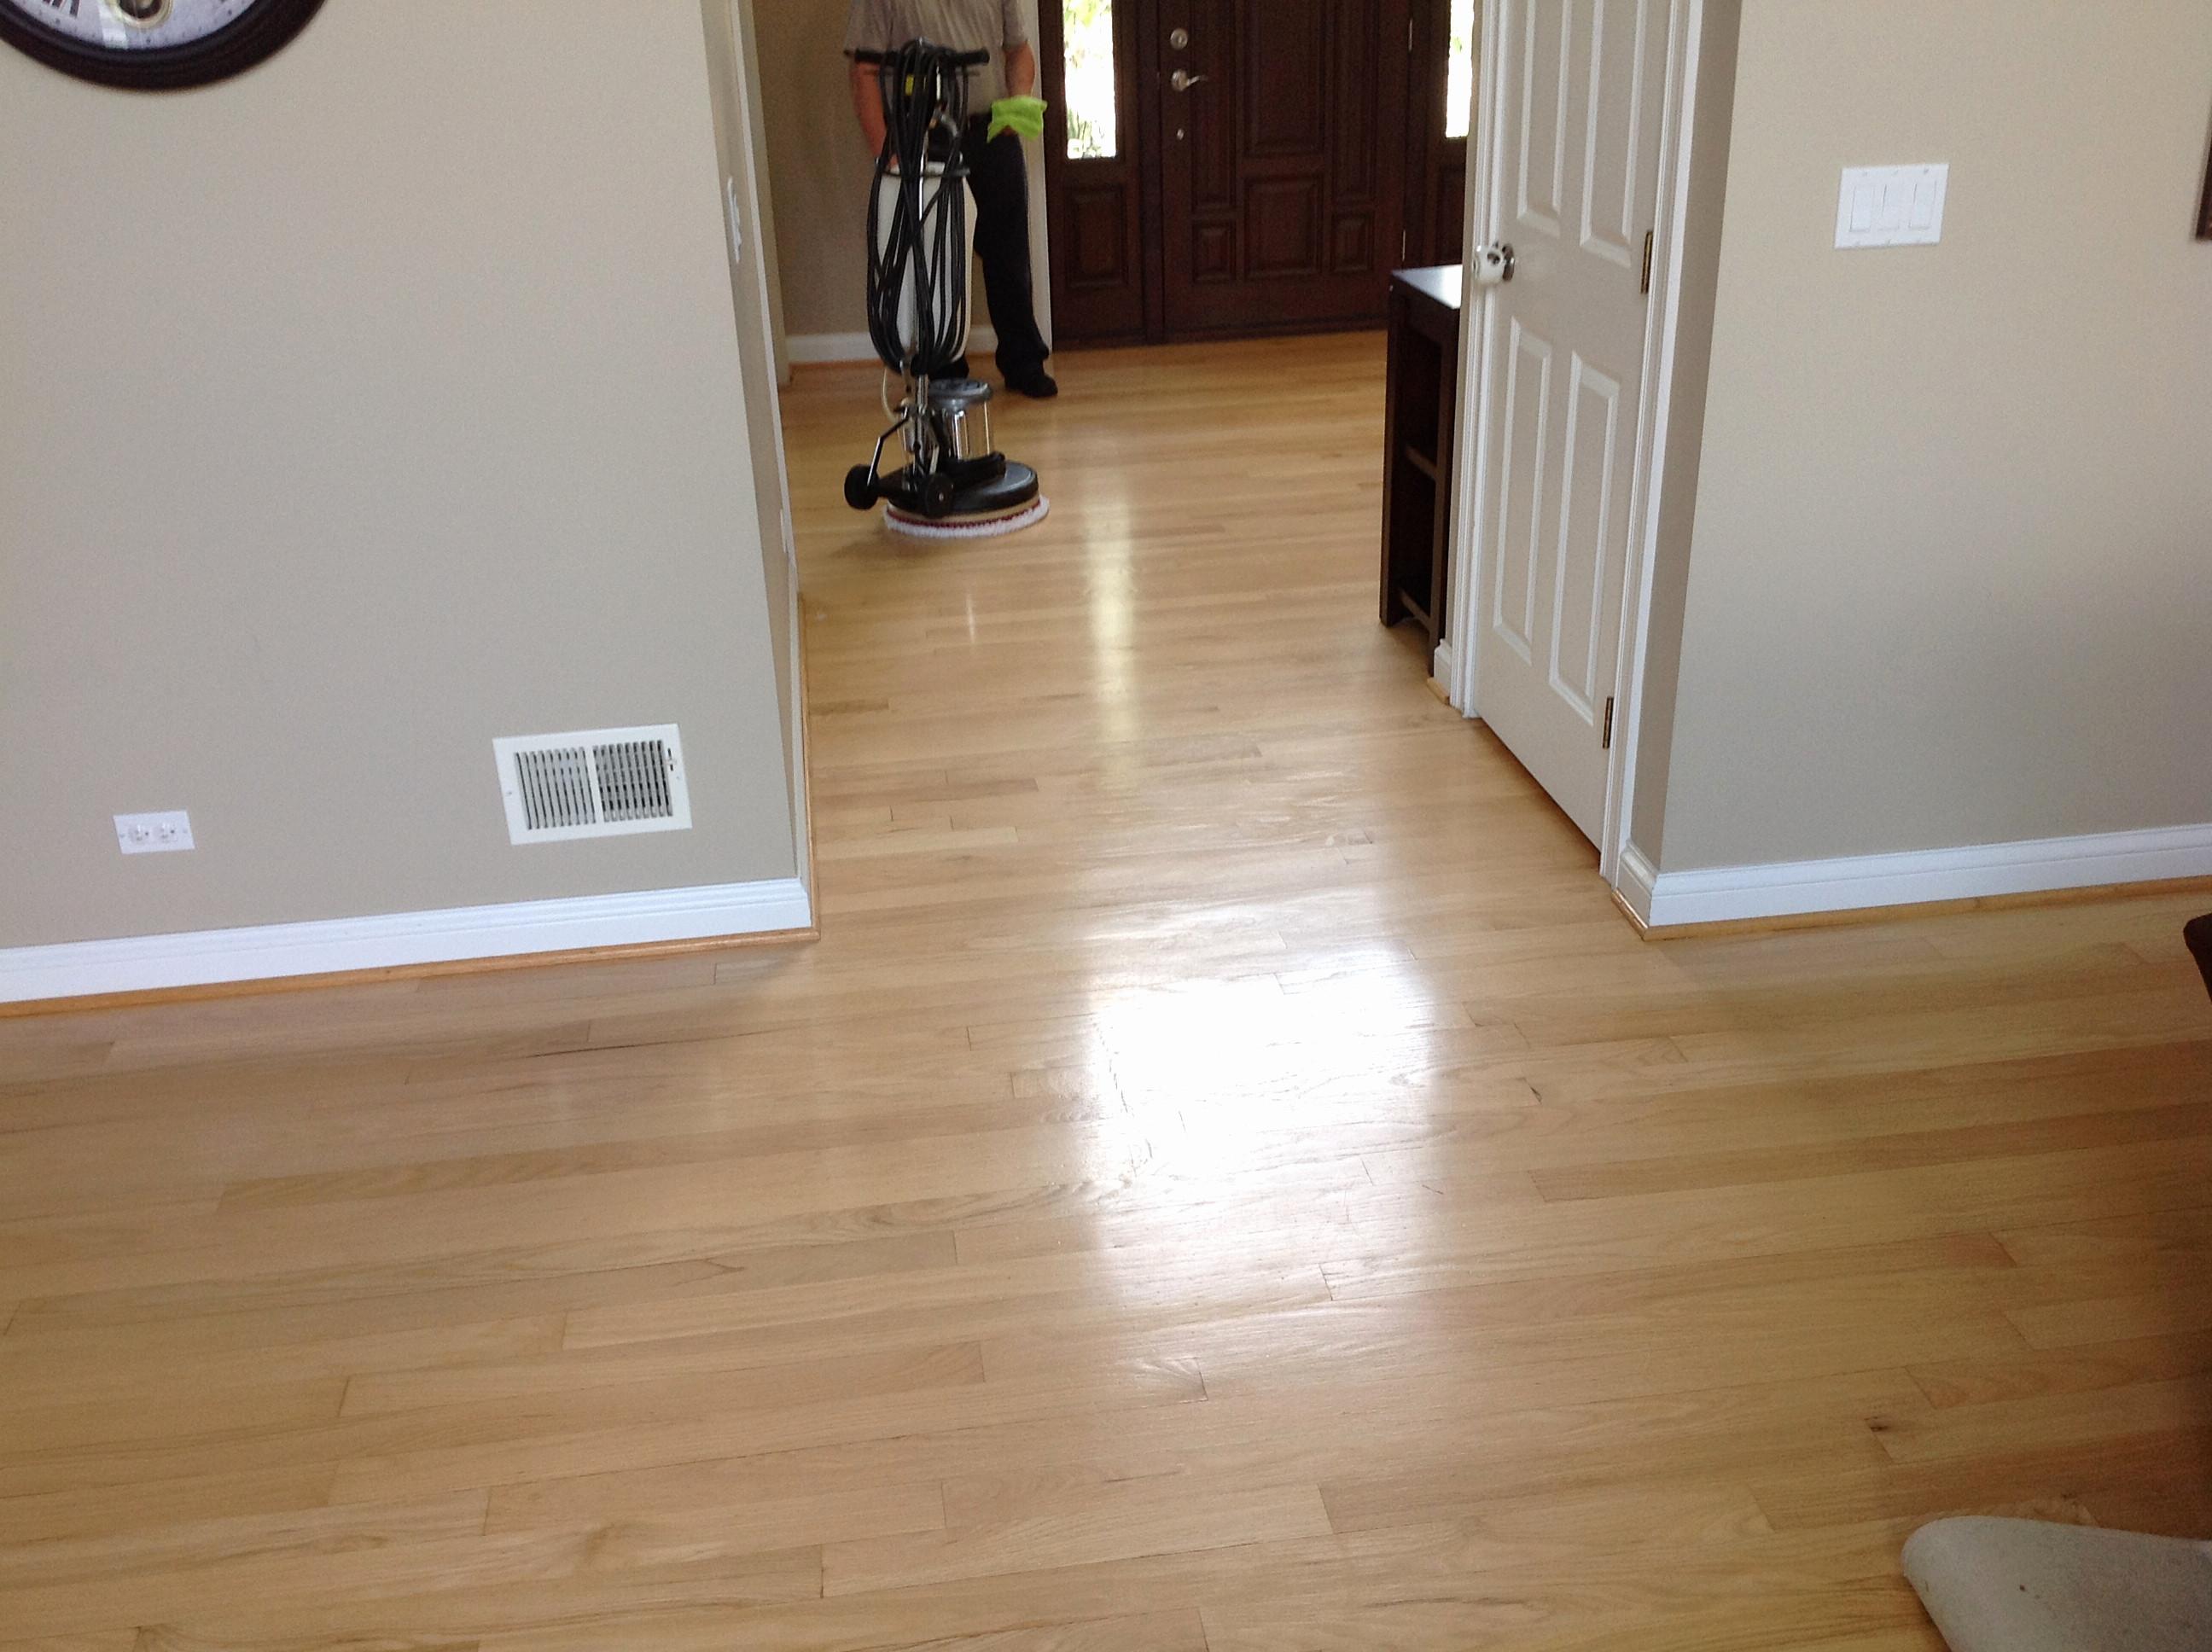 hardwood floor steam cleaner of wood floor cleaner floor floorod cleaning hardwood carpet lake pertaining to wood floor cleaner floor floorod cleaning hardwood carpet lake forest il rare image